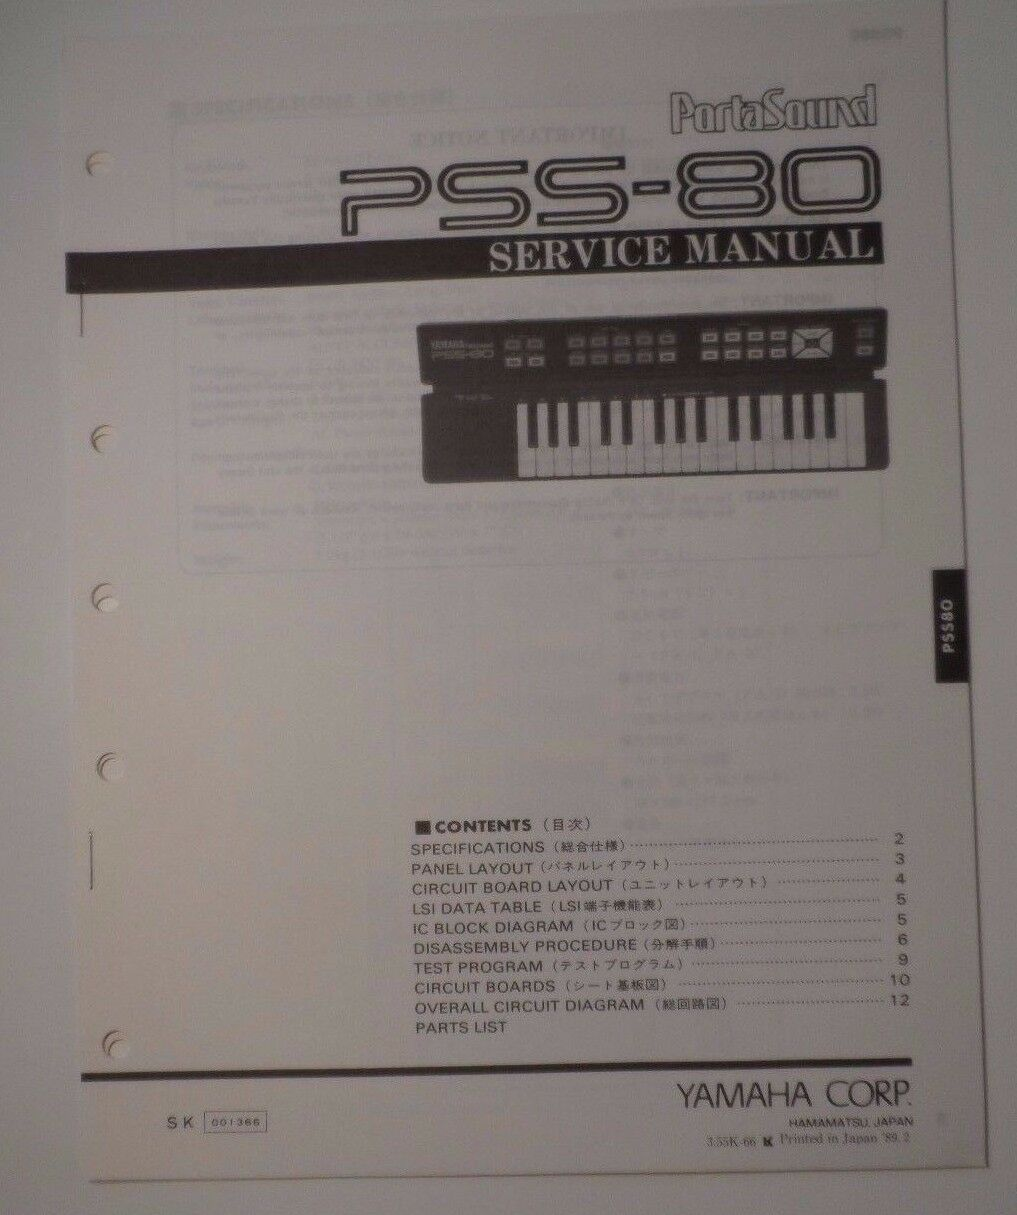 vintage yamaha portasound pss 80 electronic keyboard looks ebay rh ebay com Yamaha XS1100 Wiring-Diagram Yamaha ATV Wiring Diagram